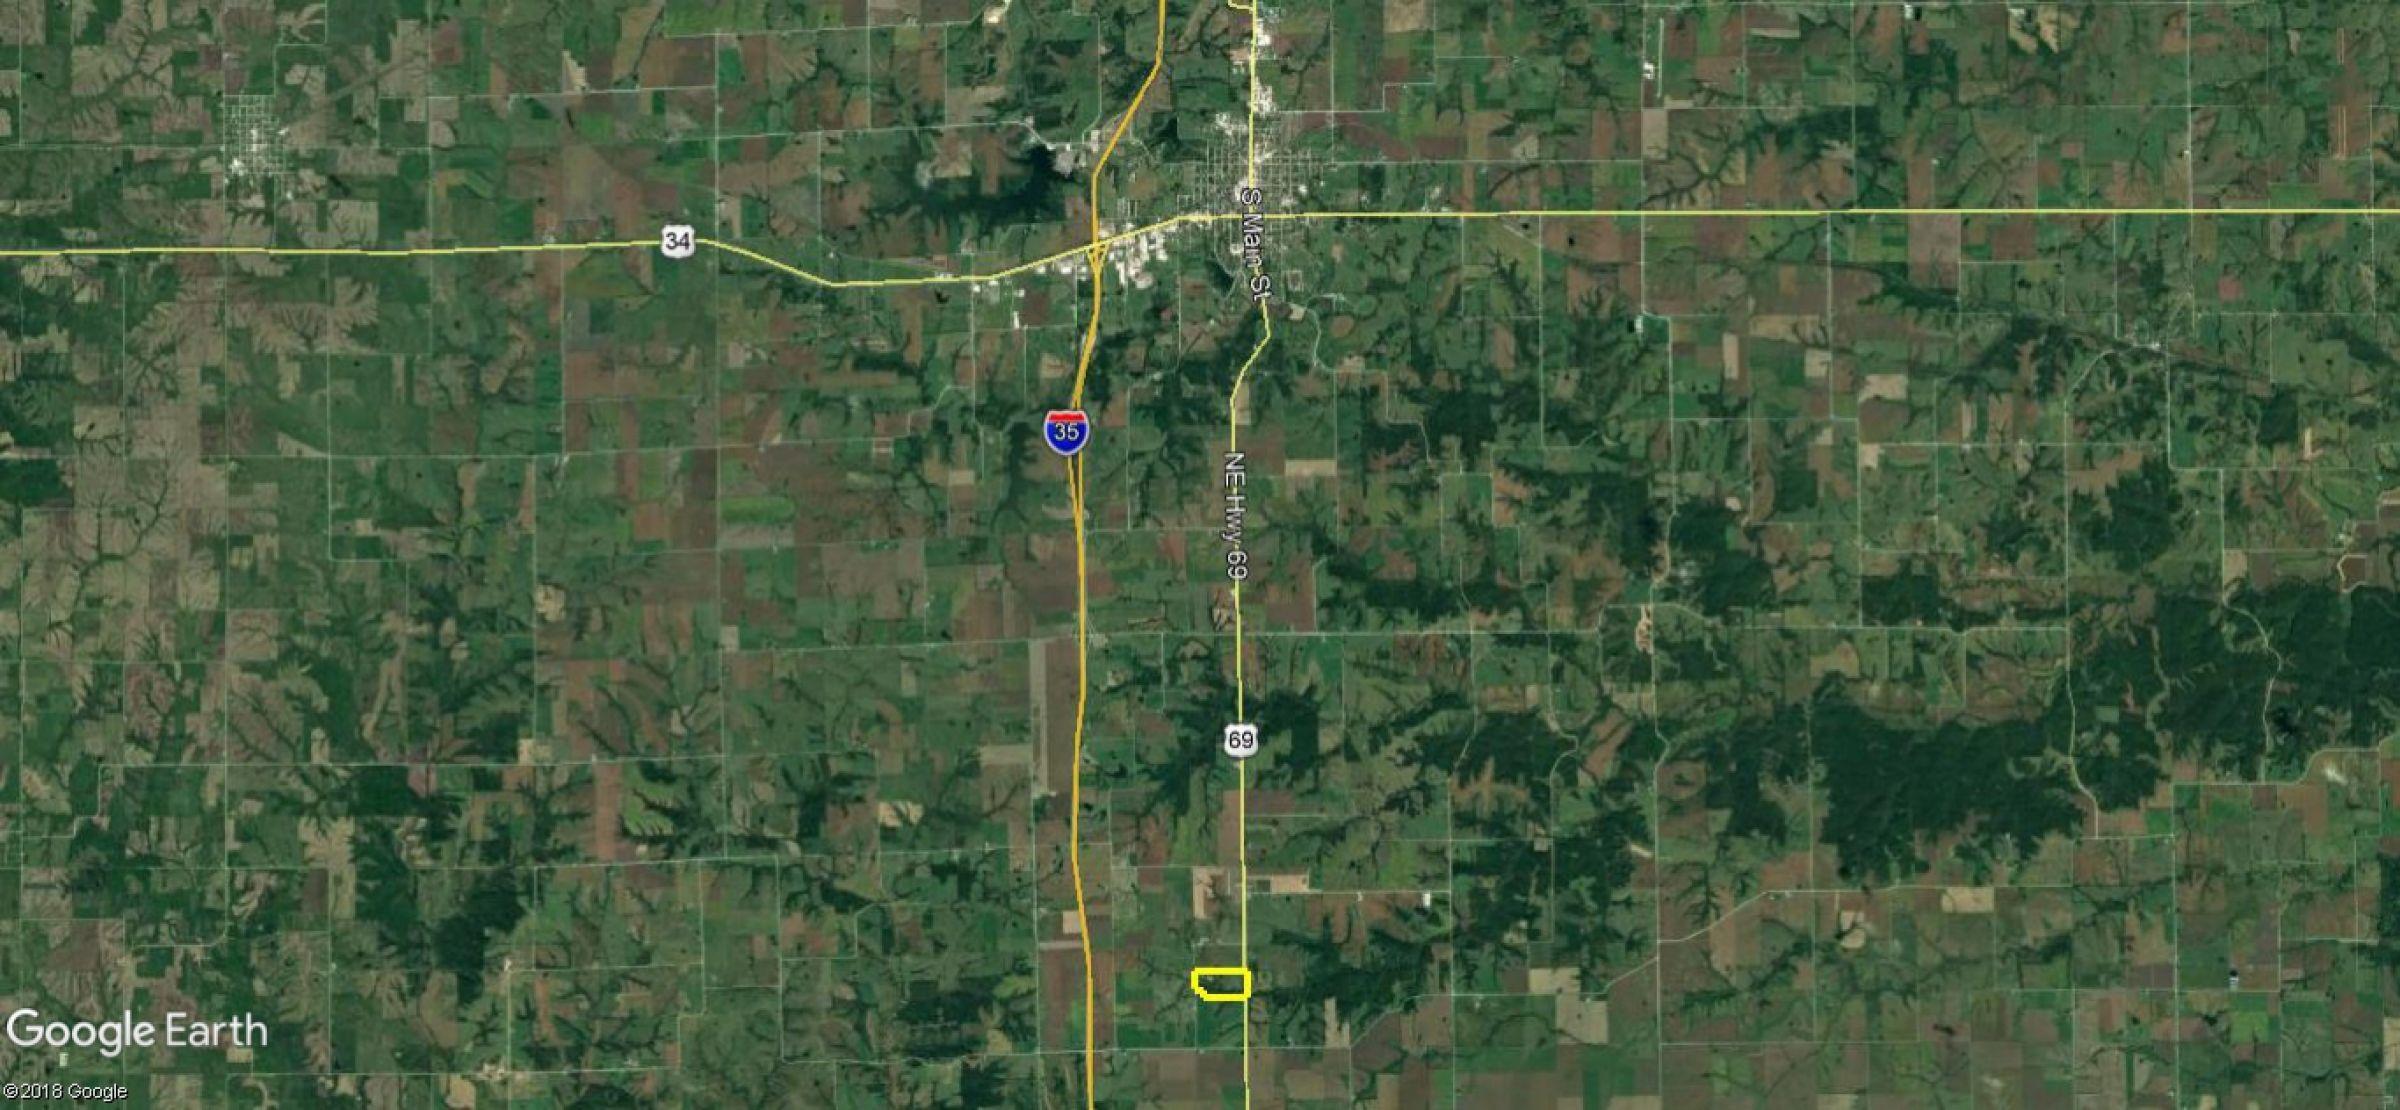 14497-78-acres-clarke-co-ia-1-2019-04-18-233708.jpg